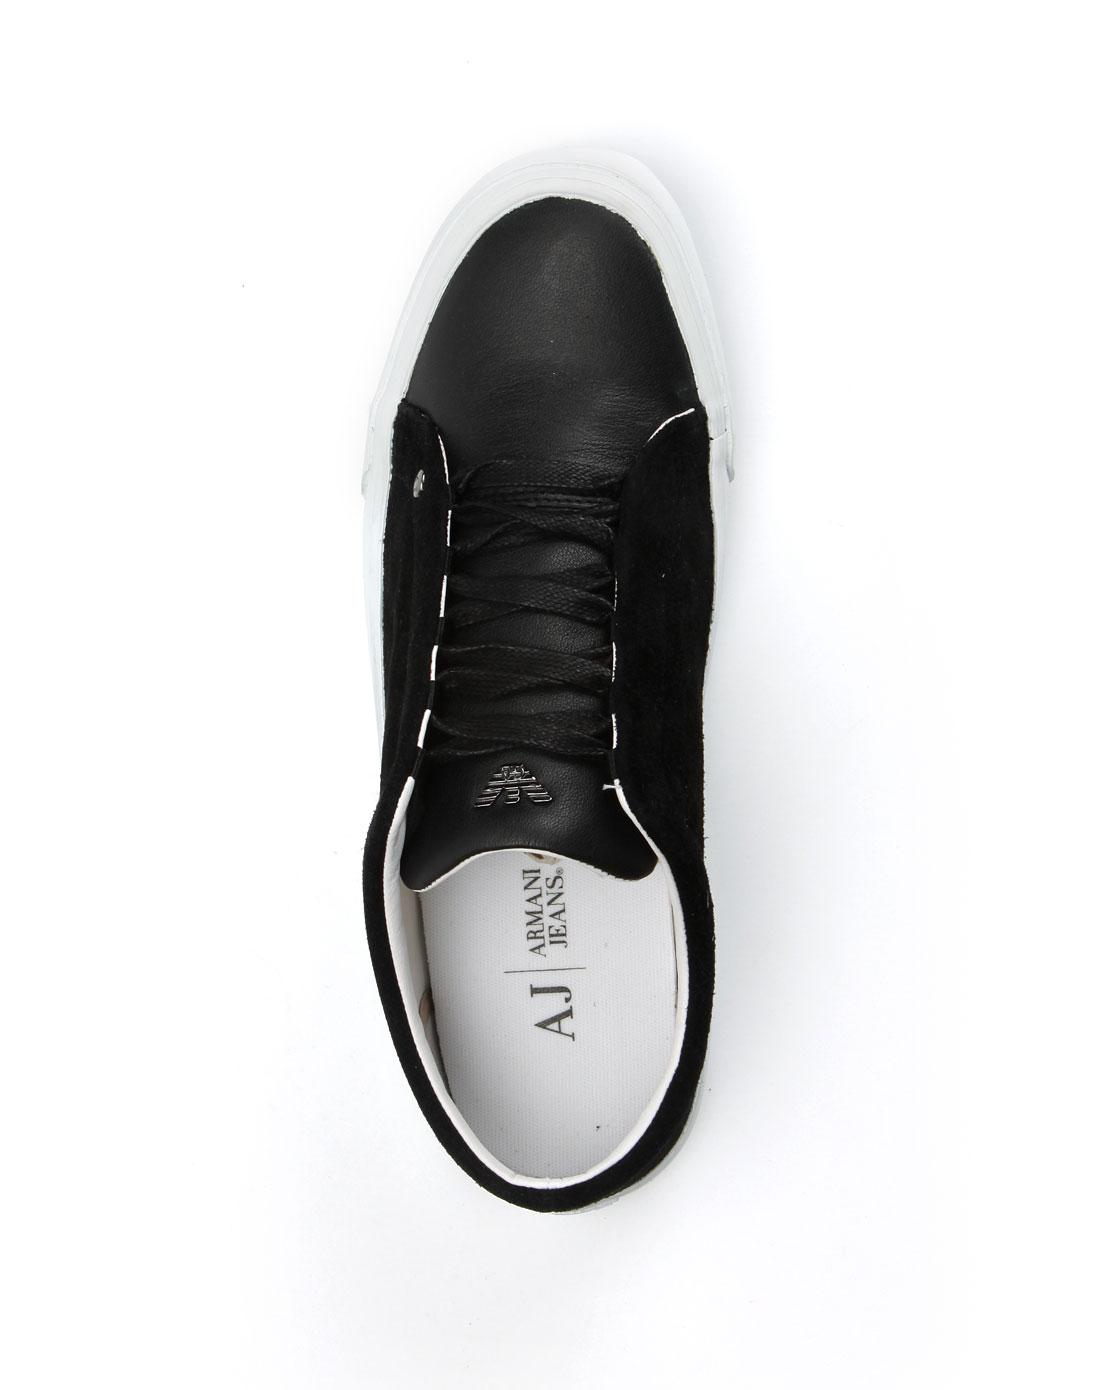 armani鞋子专场aj 女款黑色绒面休闲鞋